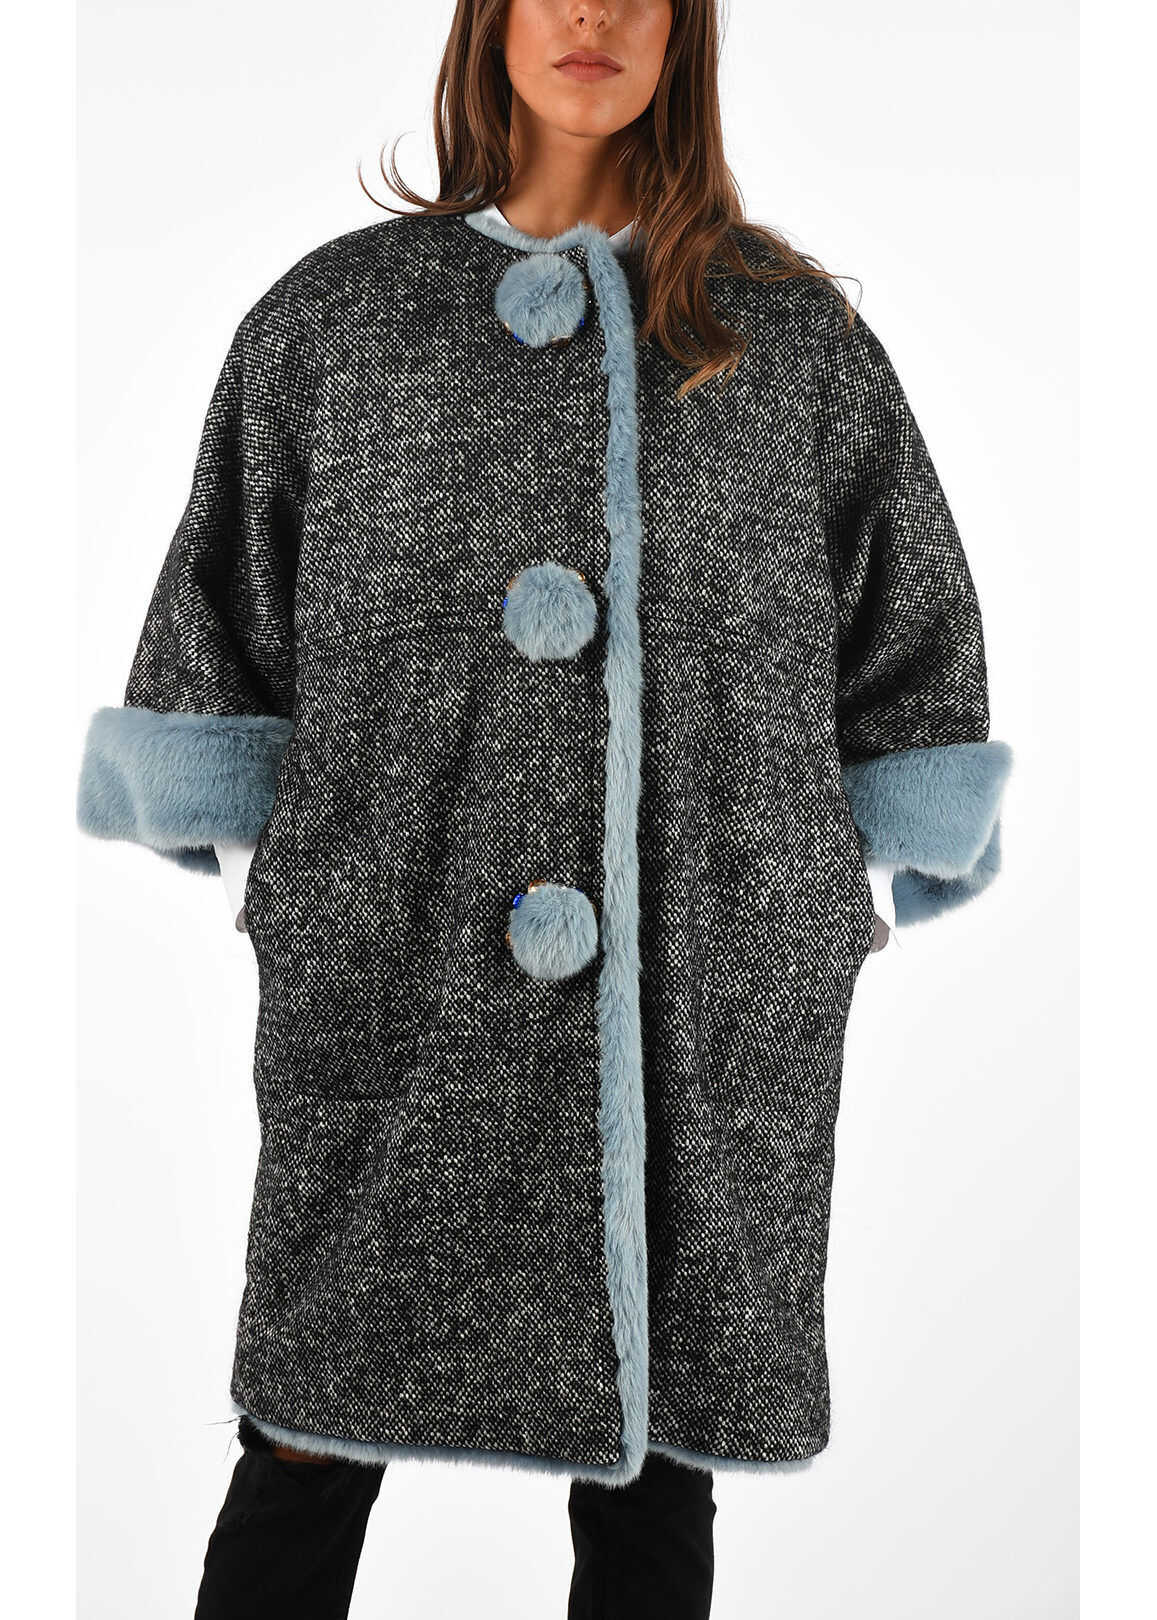 shephard's check faux fur a-line coat